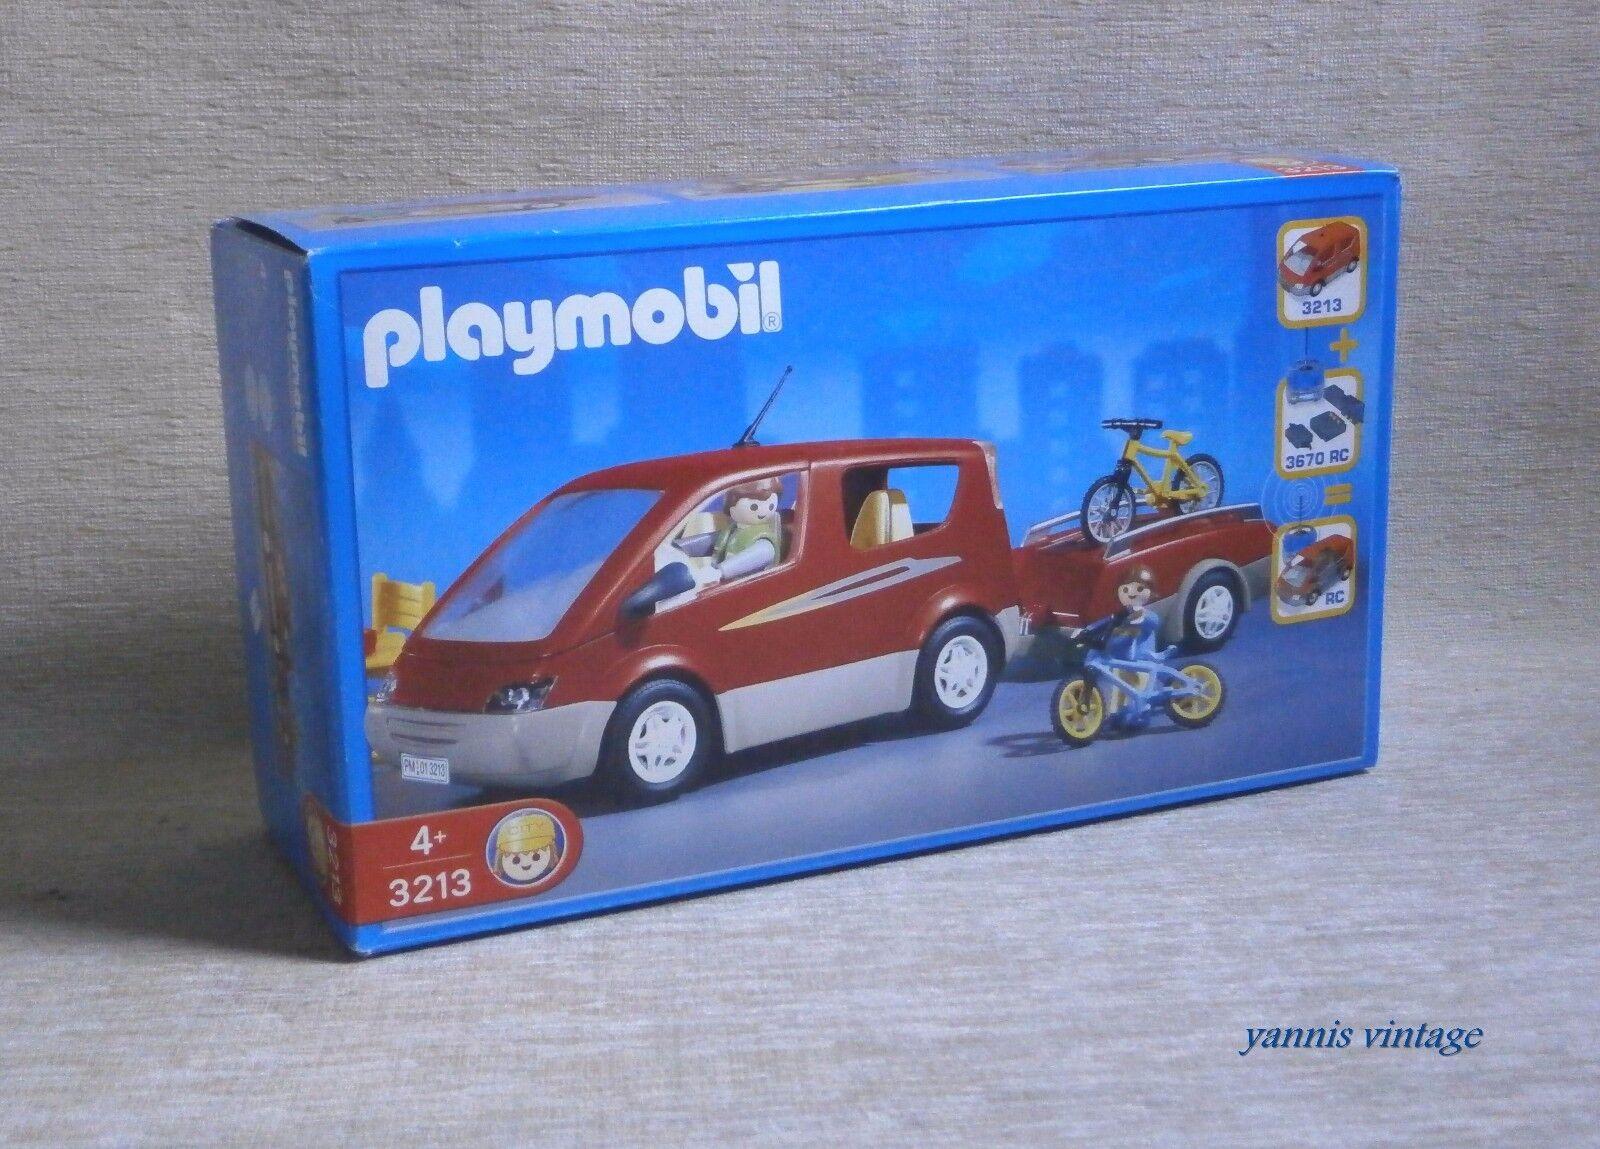 PLAYMOBIL Nº 3213  famille Van  DGSIM trafic Made  in Gerhommey 2001  venez choisir votre propre style sportif